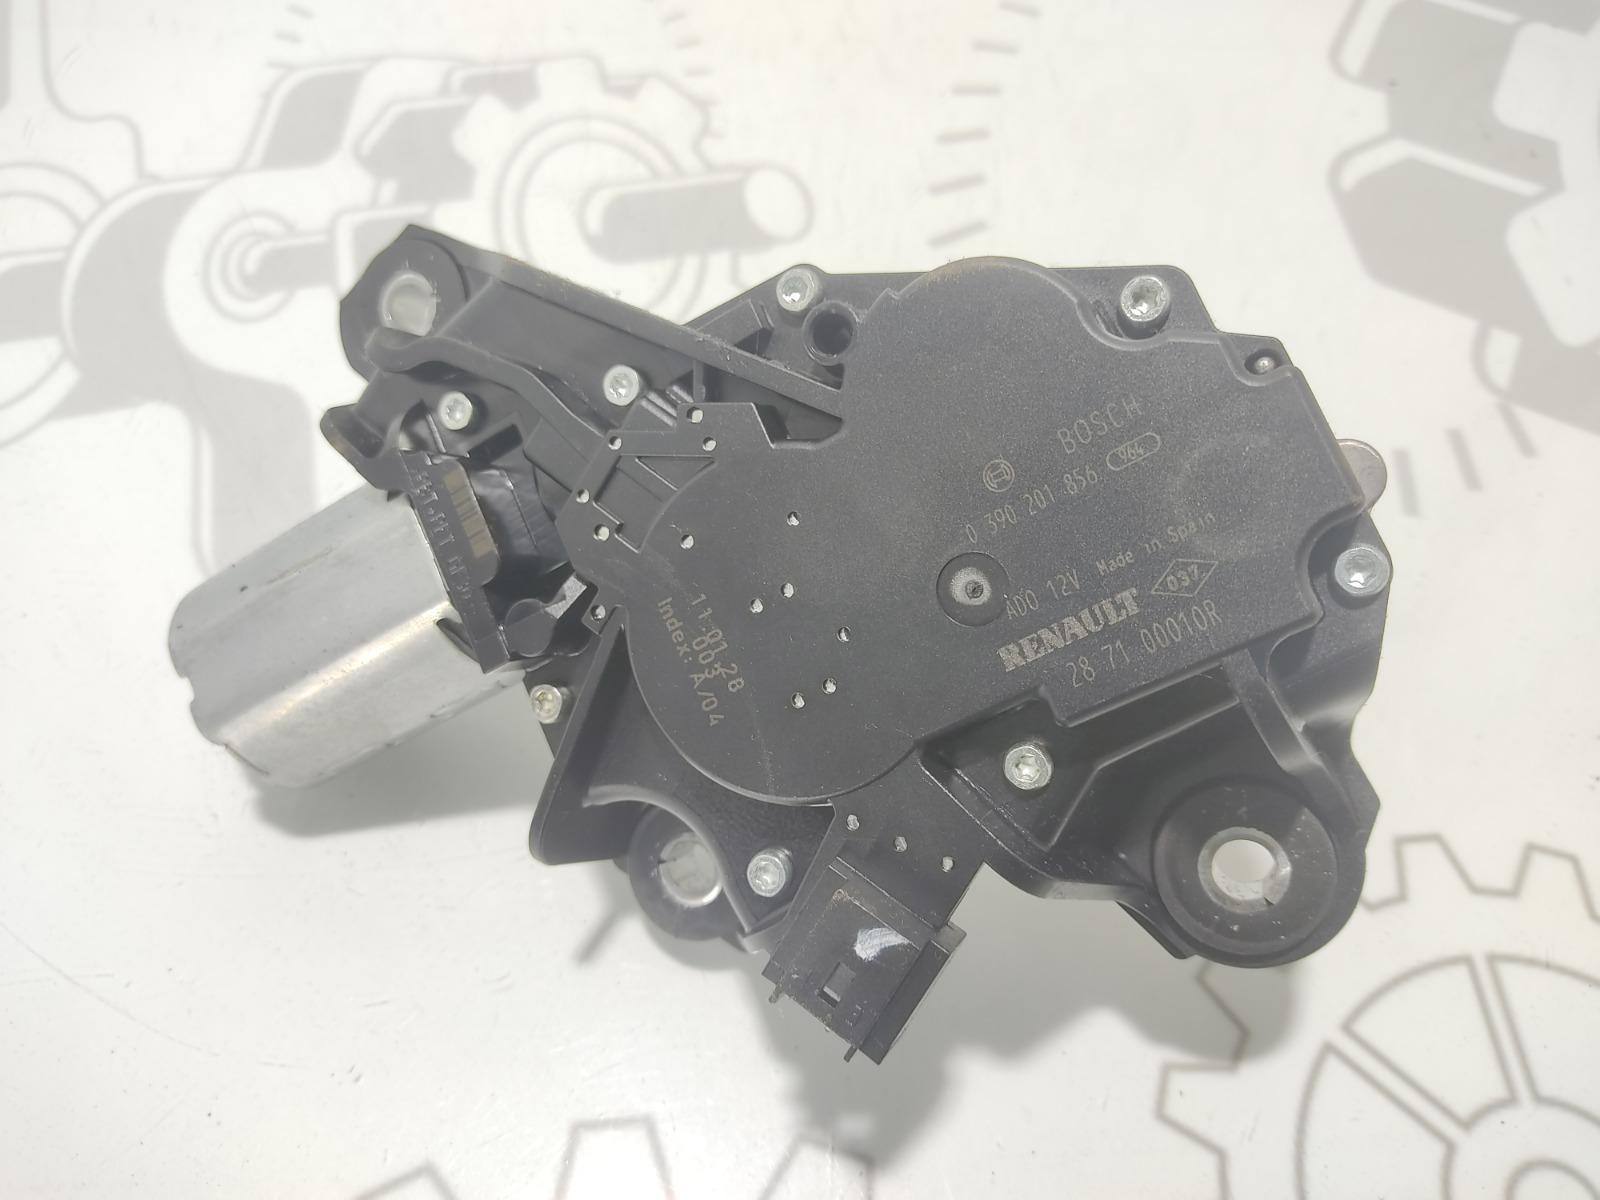 Моторчик заднего стеклоочистителя (дворника) Renault Grand Scenic 1.6 I 2011 (б/у)